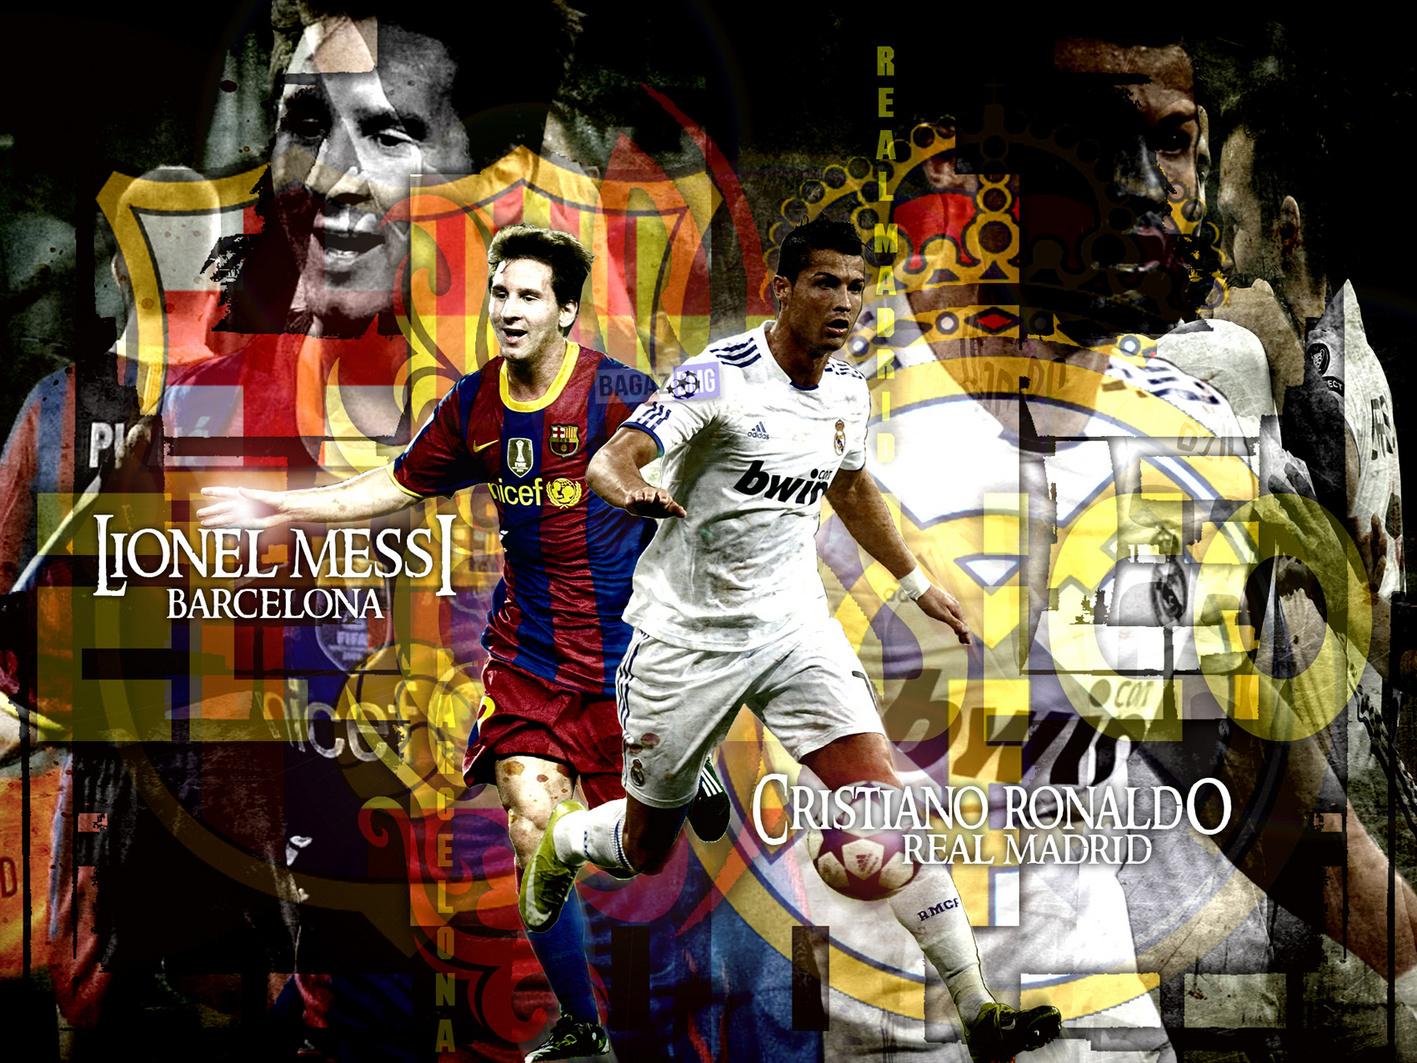 http://2.bp.blogspot.com/-zmM1gp_7J_Q/USDqjpswvRI/AAAAAAAABlc/0gz2JlVT7aM/s1600/Lionel+Messi+Vs+Cristiano+Ronaldo+Wallpapers.jpg